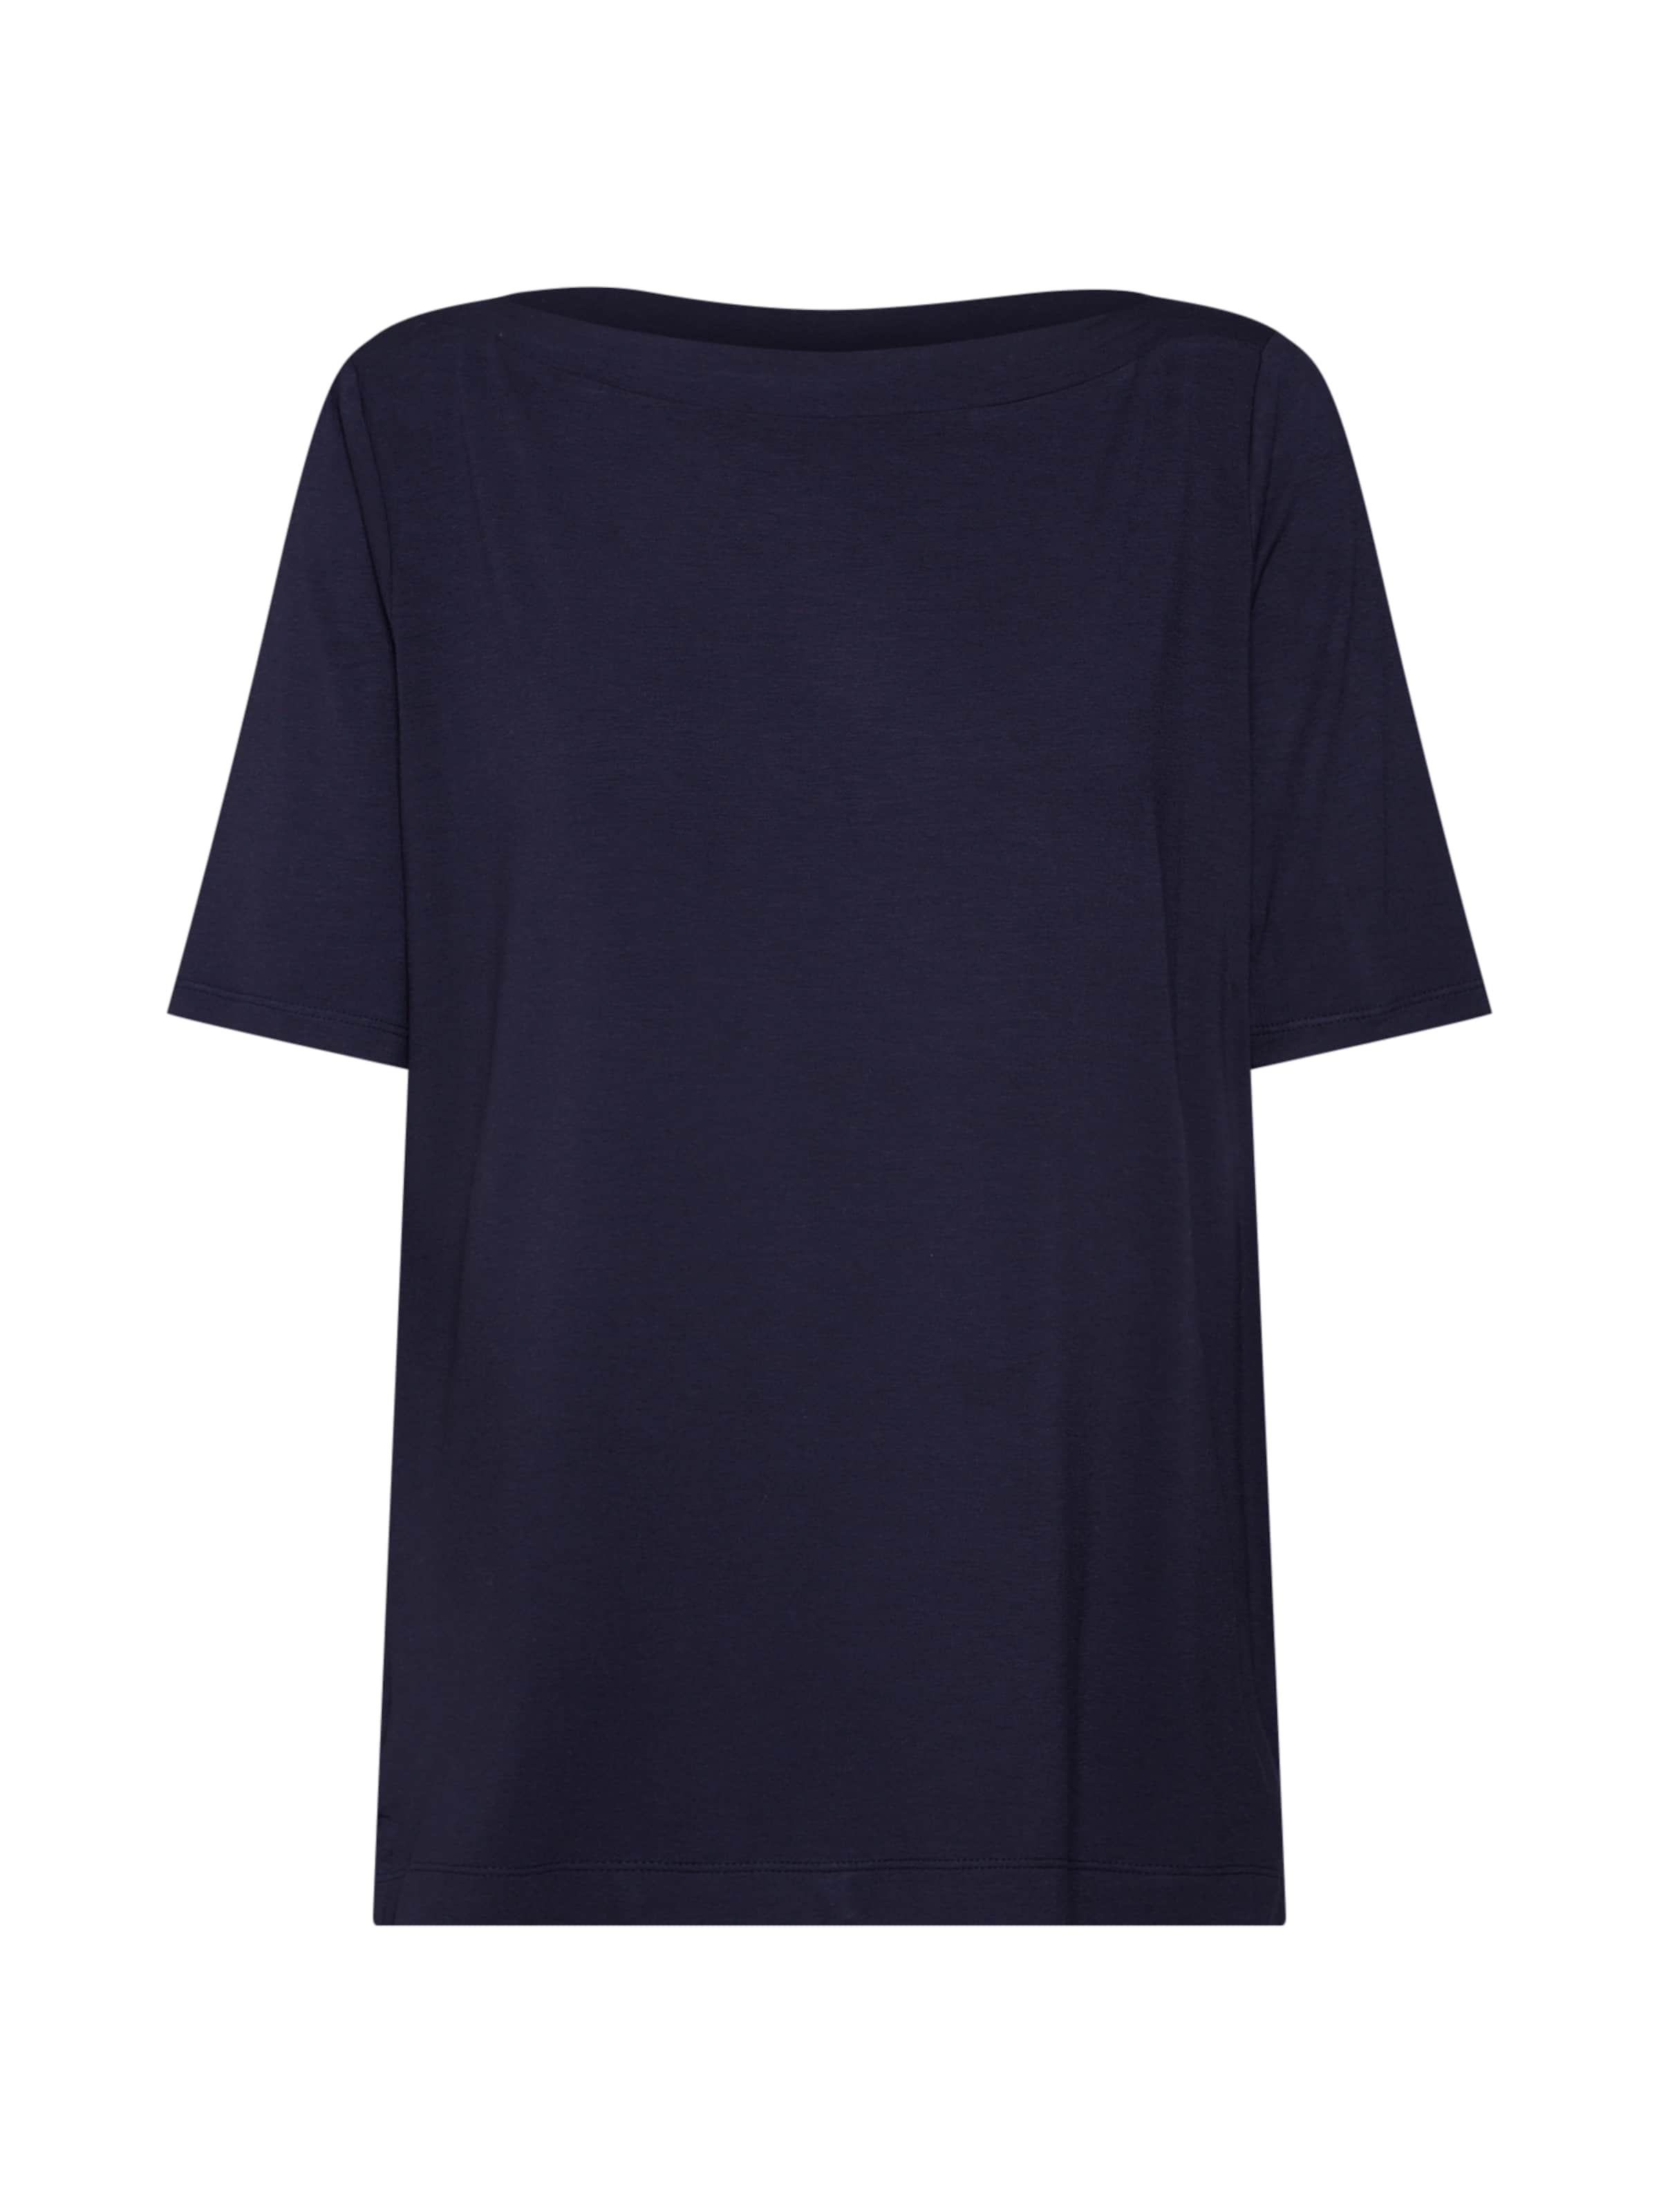 Shirt In Shirt Navy oliver S In S oliver 54L3RjA